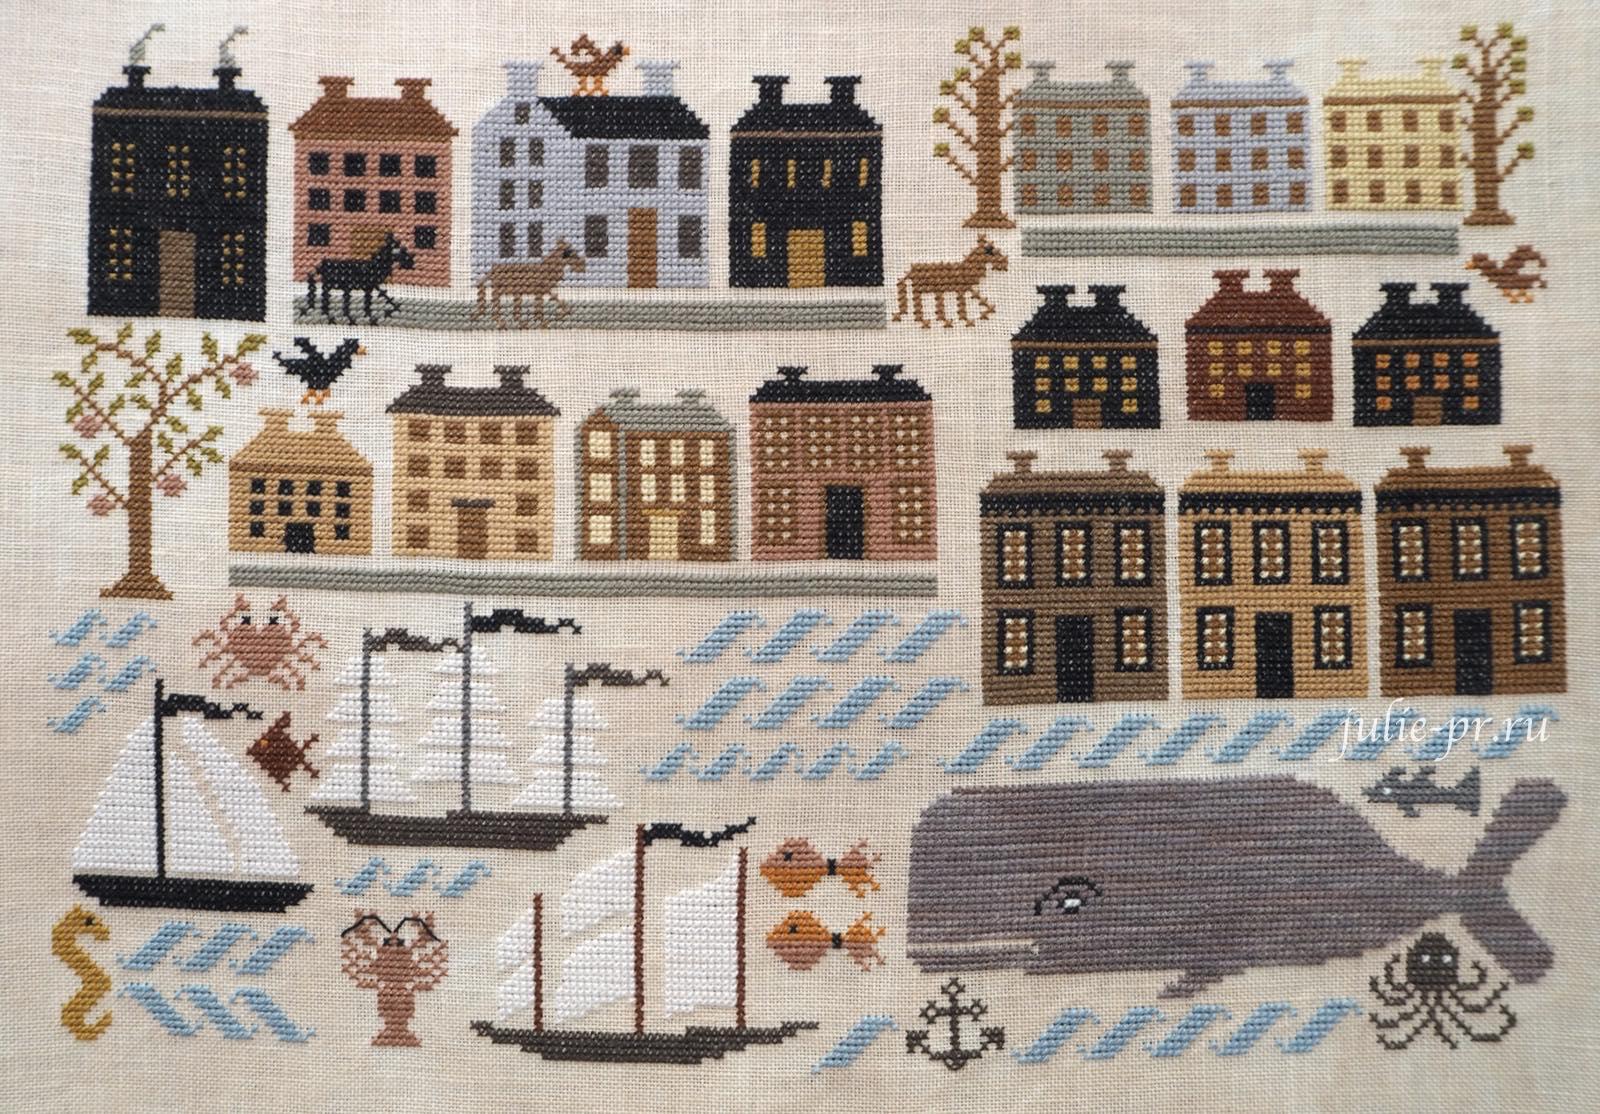 Kathy Barrick, Riley Harbor, гавань райли, вышивка крестом, примитив, кашалот, кит